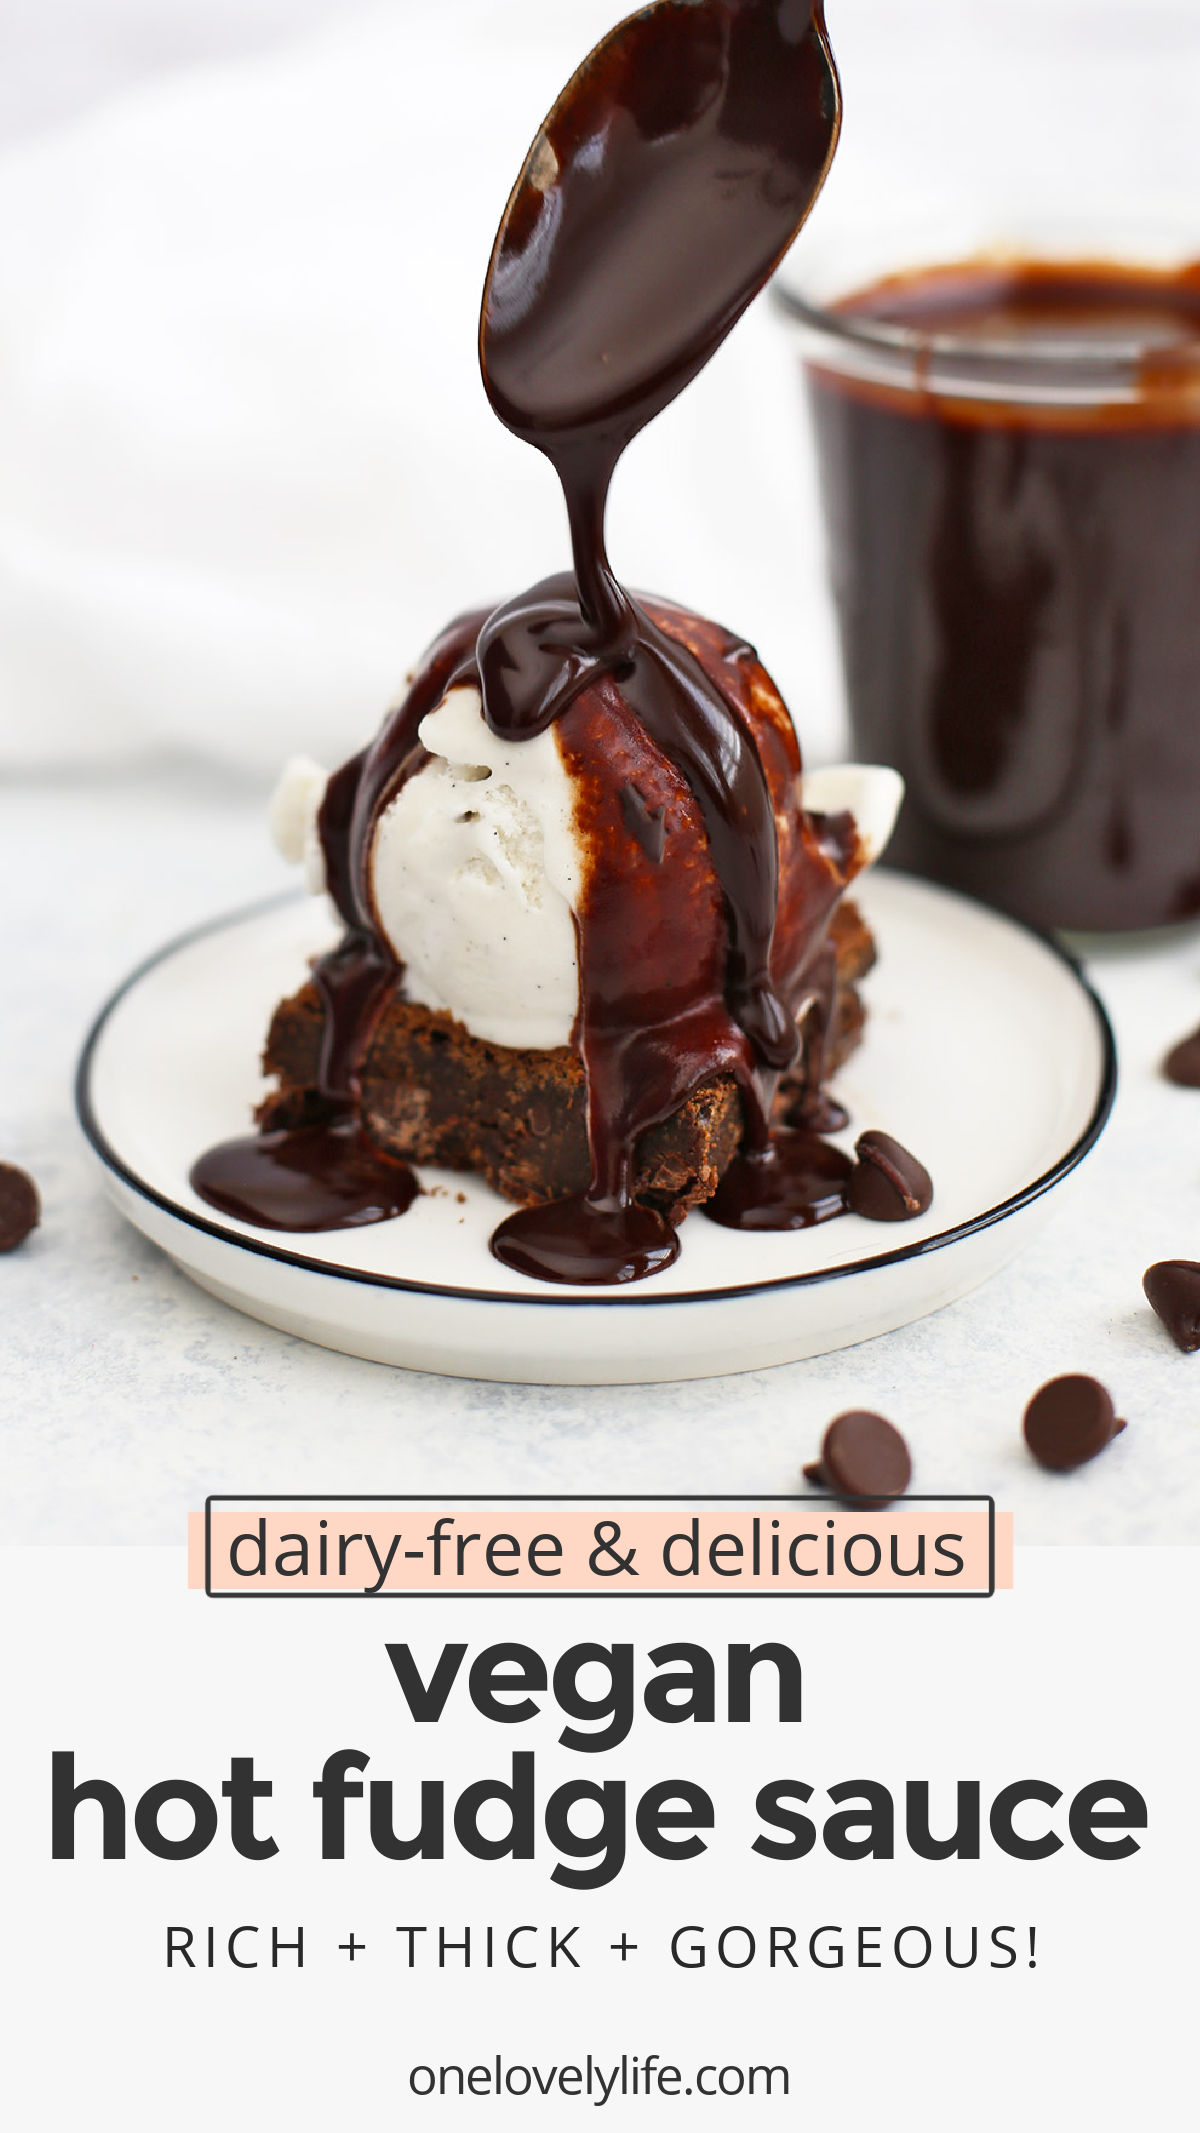 Vegan Hot Fudge Sauce - This dairy free chocolate sauce is perfect for ice cream sundaes and so much more! (gluten free, dairy free) // Dairy Free Hot Fudge Sauce // Healthy Hot Fudge Sauce // Chocolate Sauce // Ice Cream Toppings #icecream #hotfudge #chocolate #vegan #dairyfree